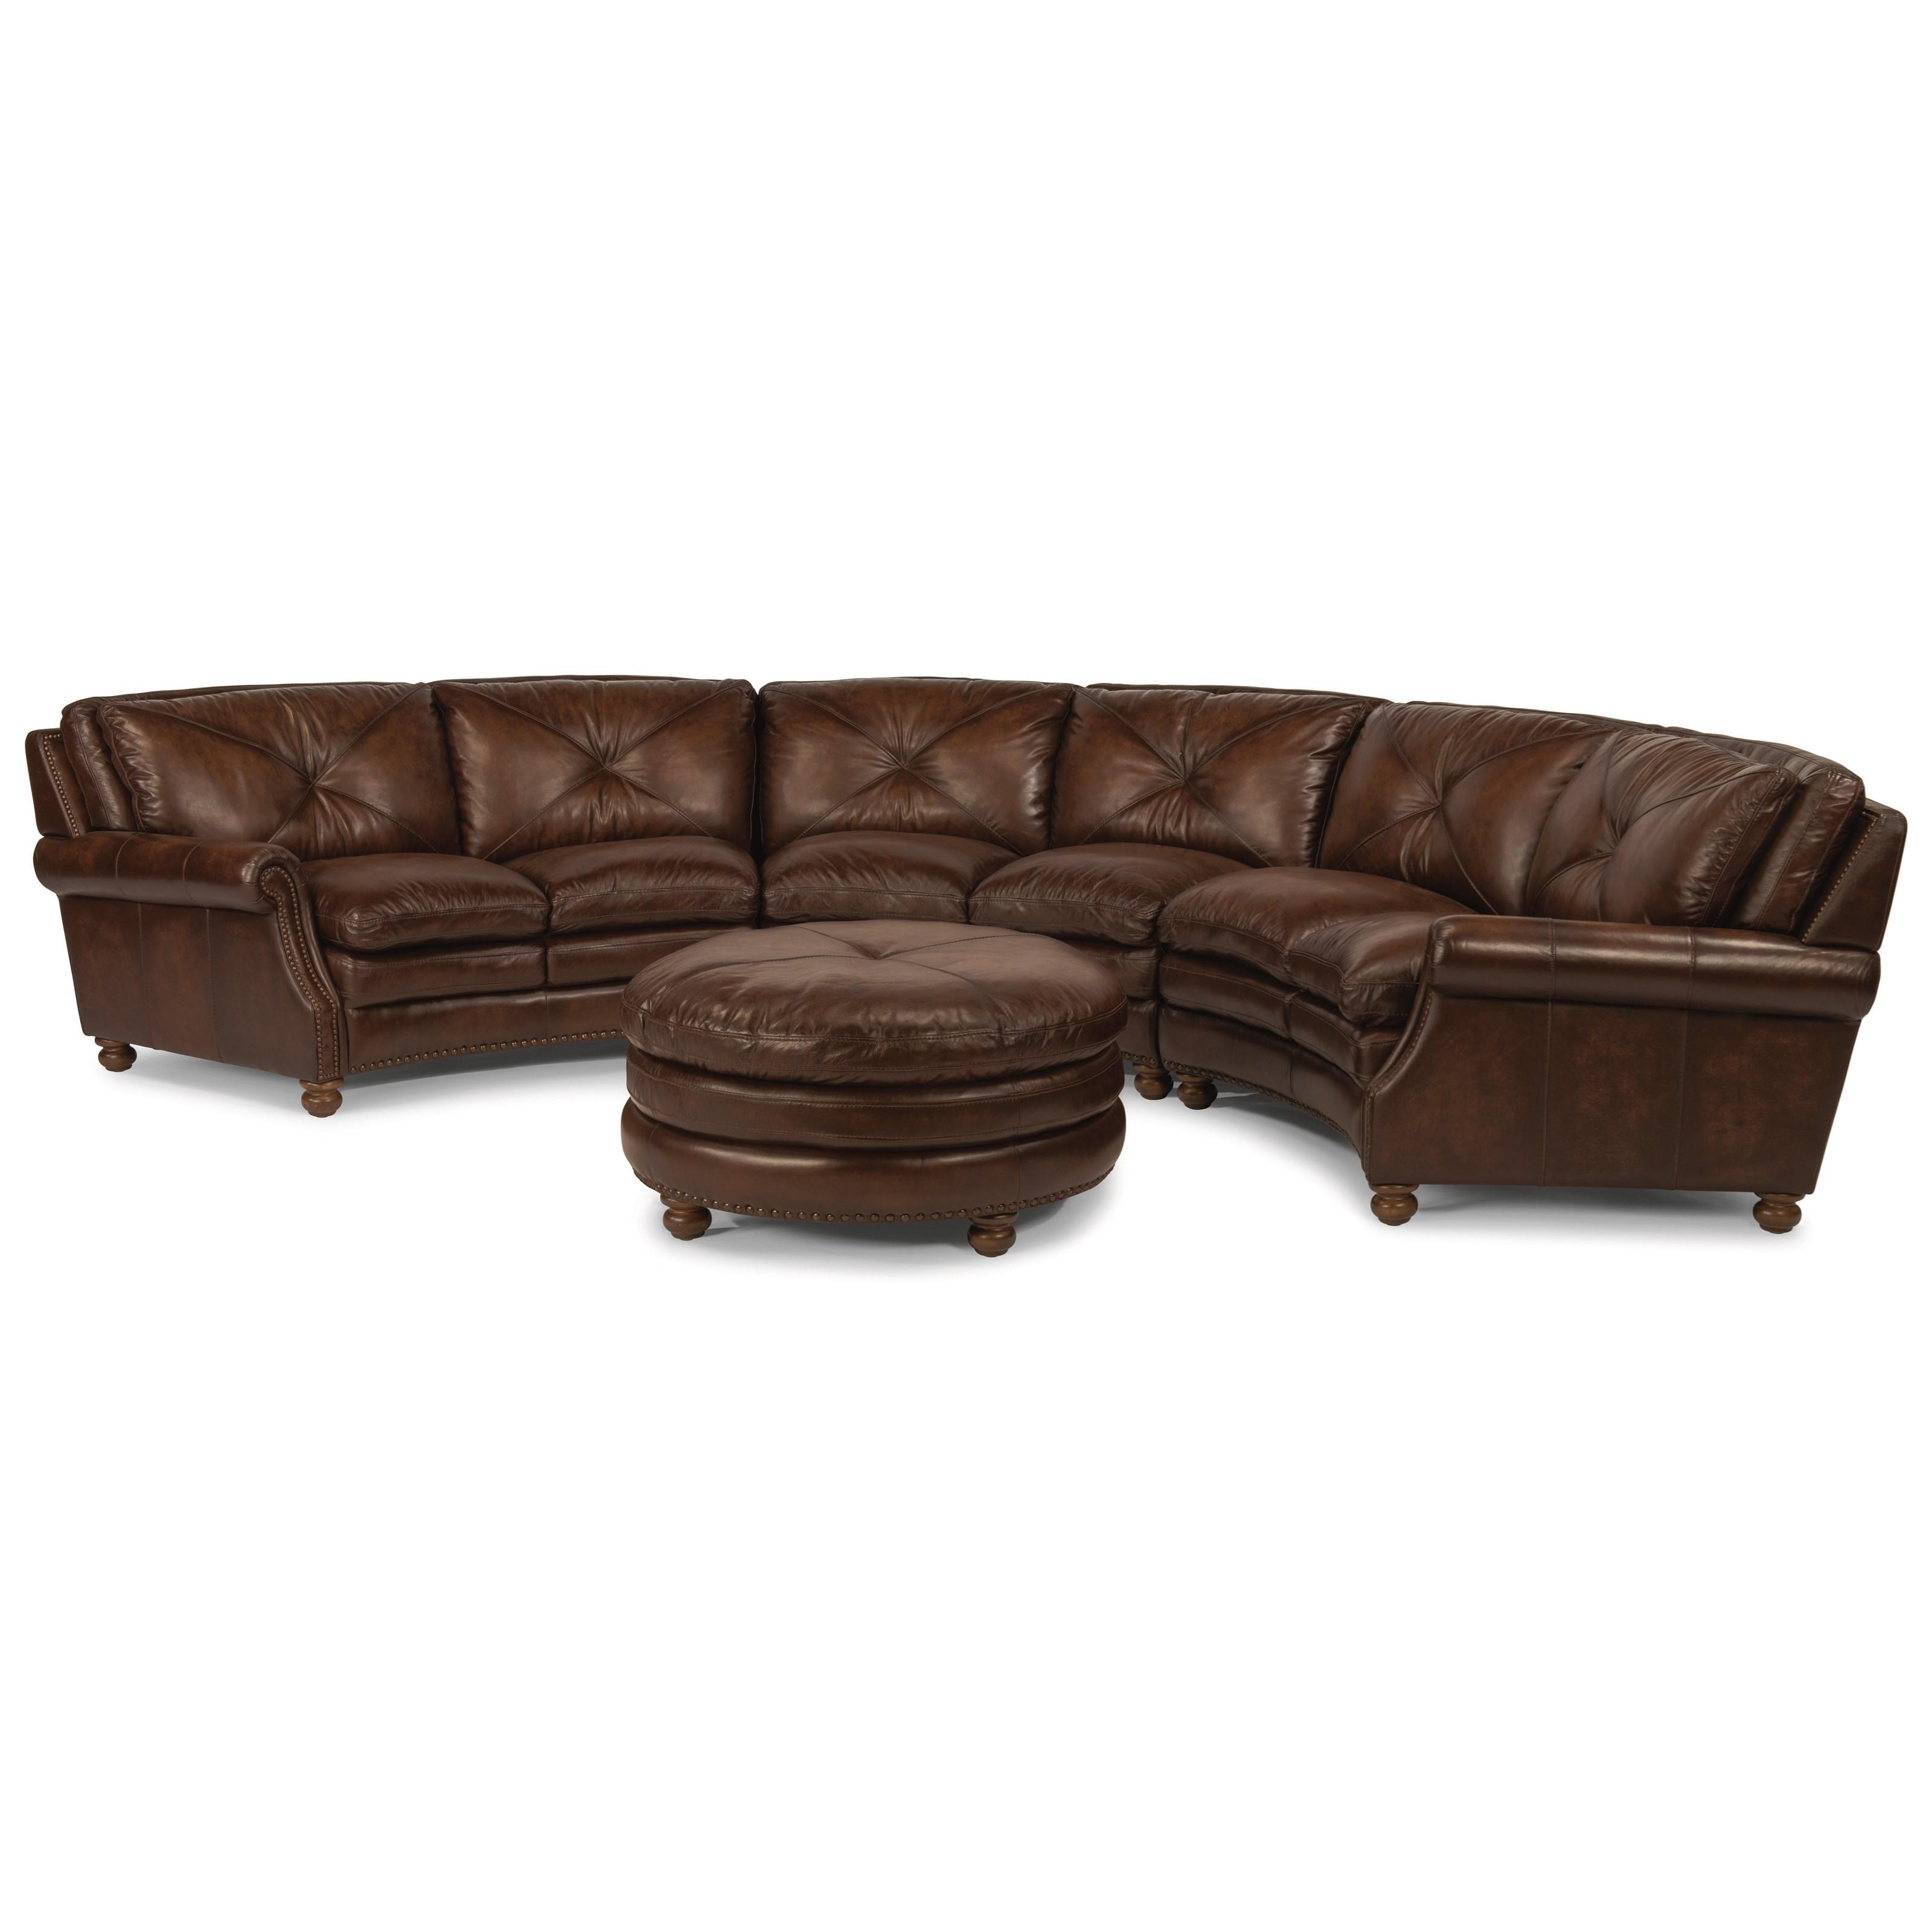 Flexsteel Latitudes-Suffolk Round Sectional Sofa With